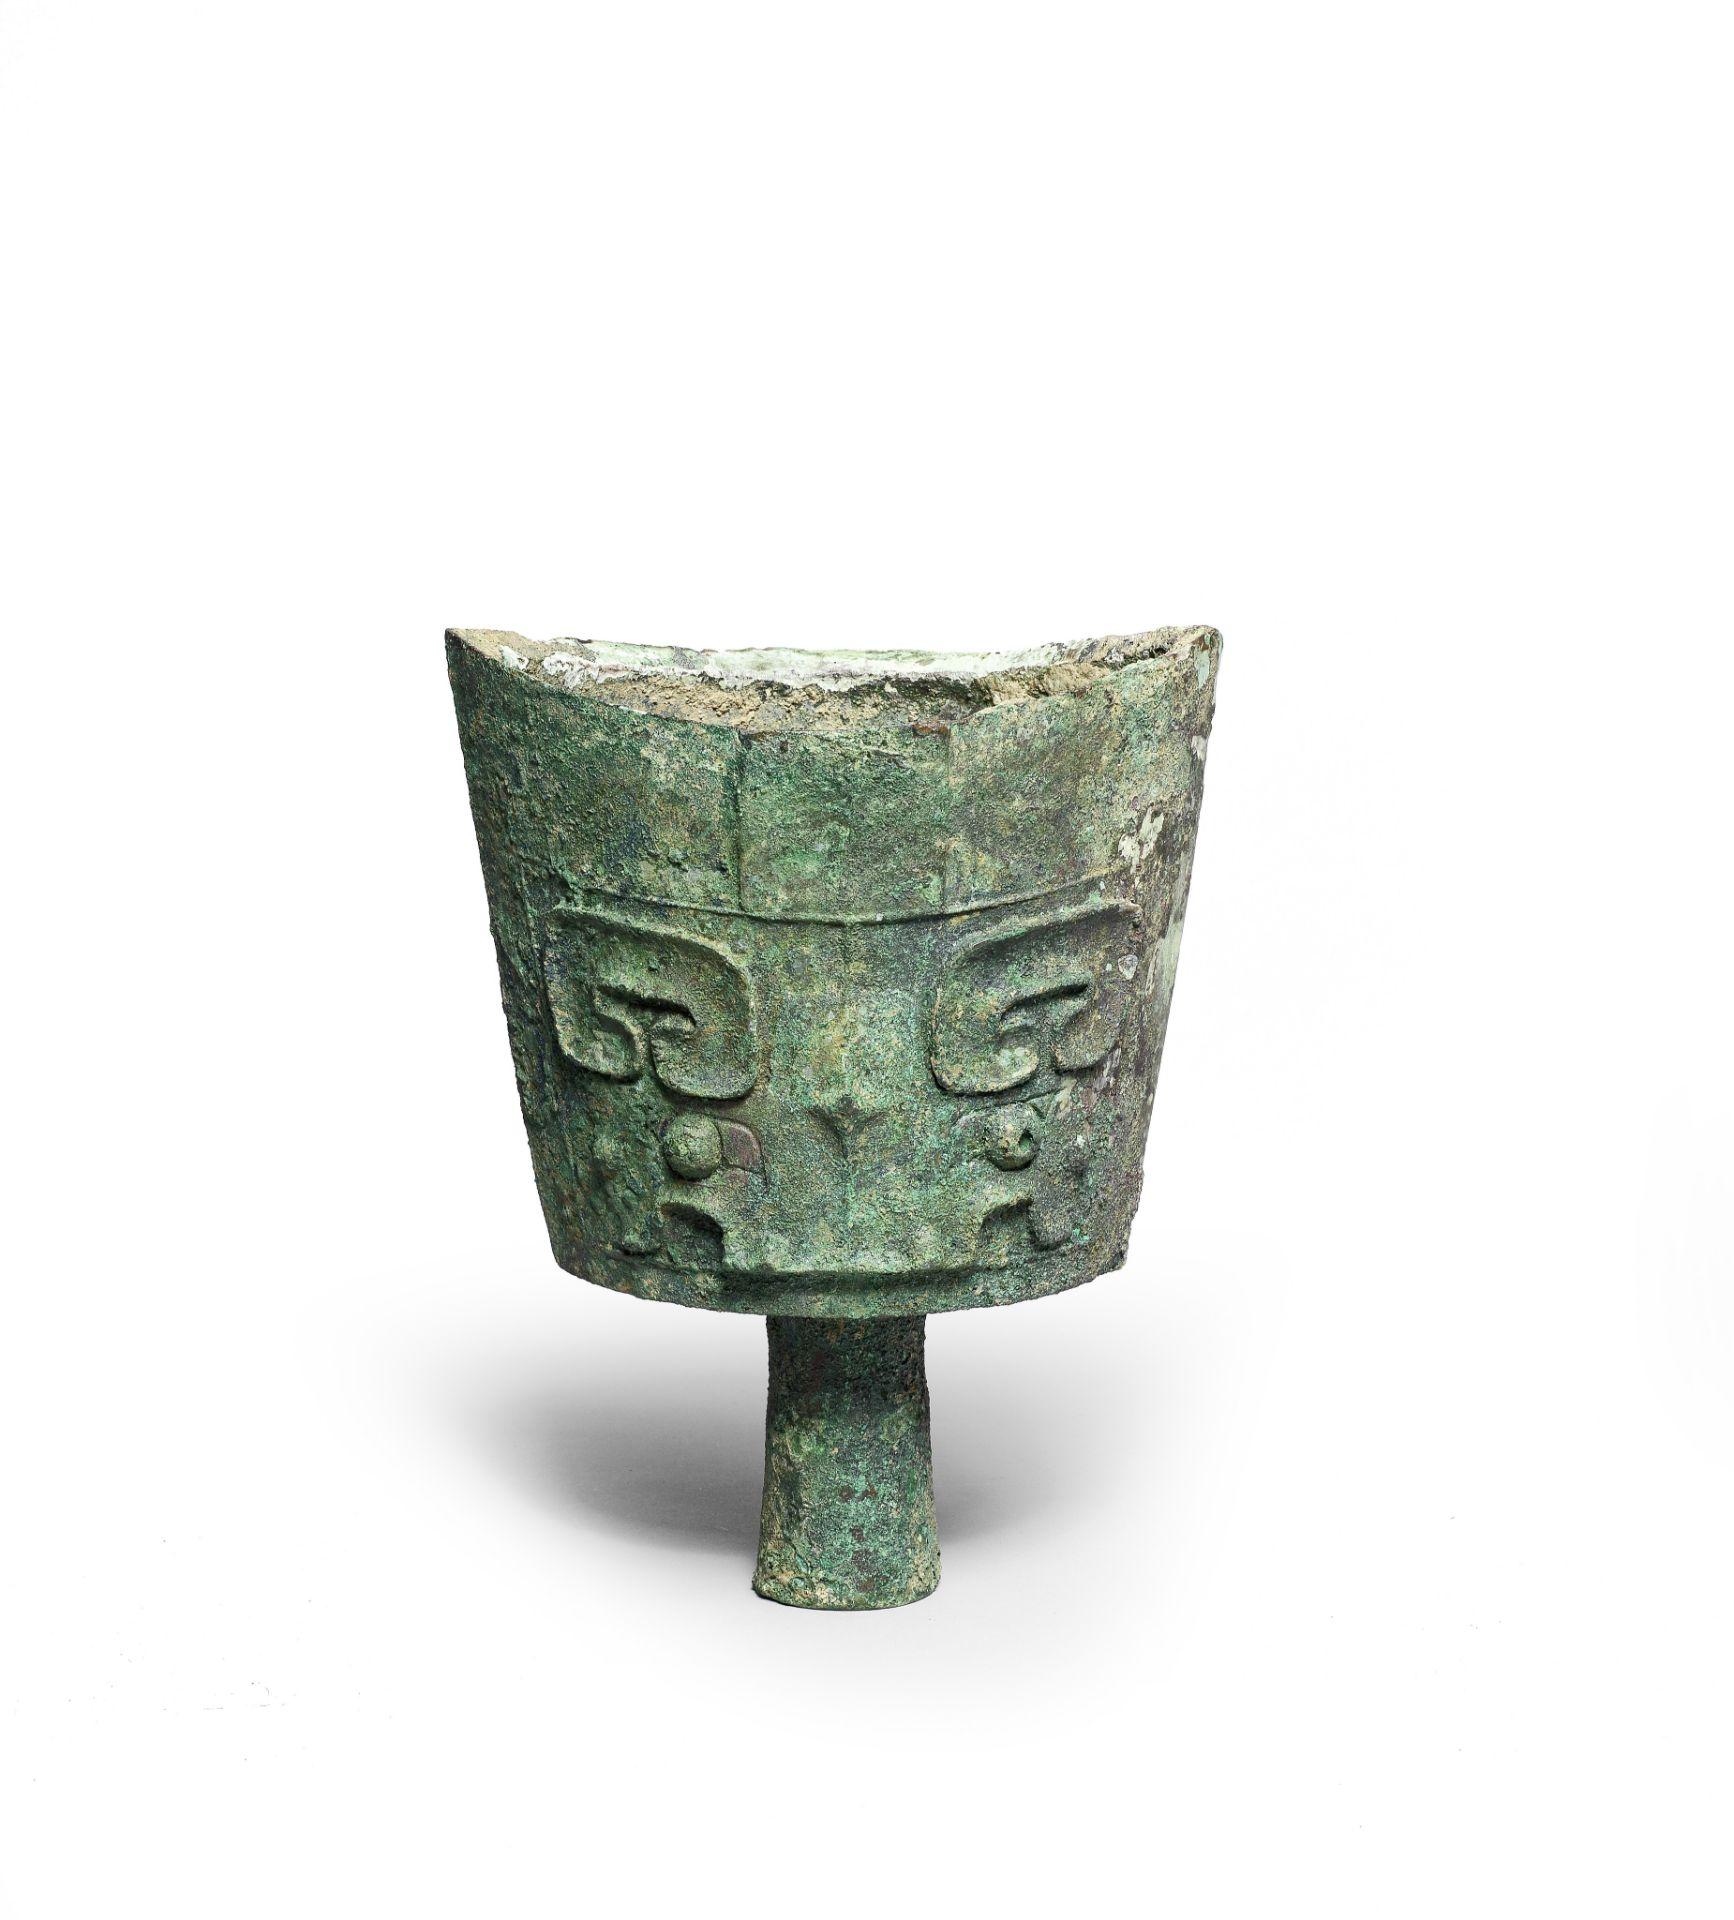 A RARE ARCHAIC BRONZE RITUAL BELL, NAO Late Shang Dynasty (2)